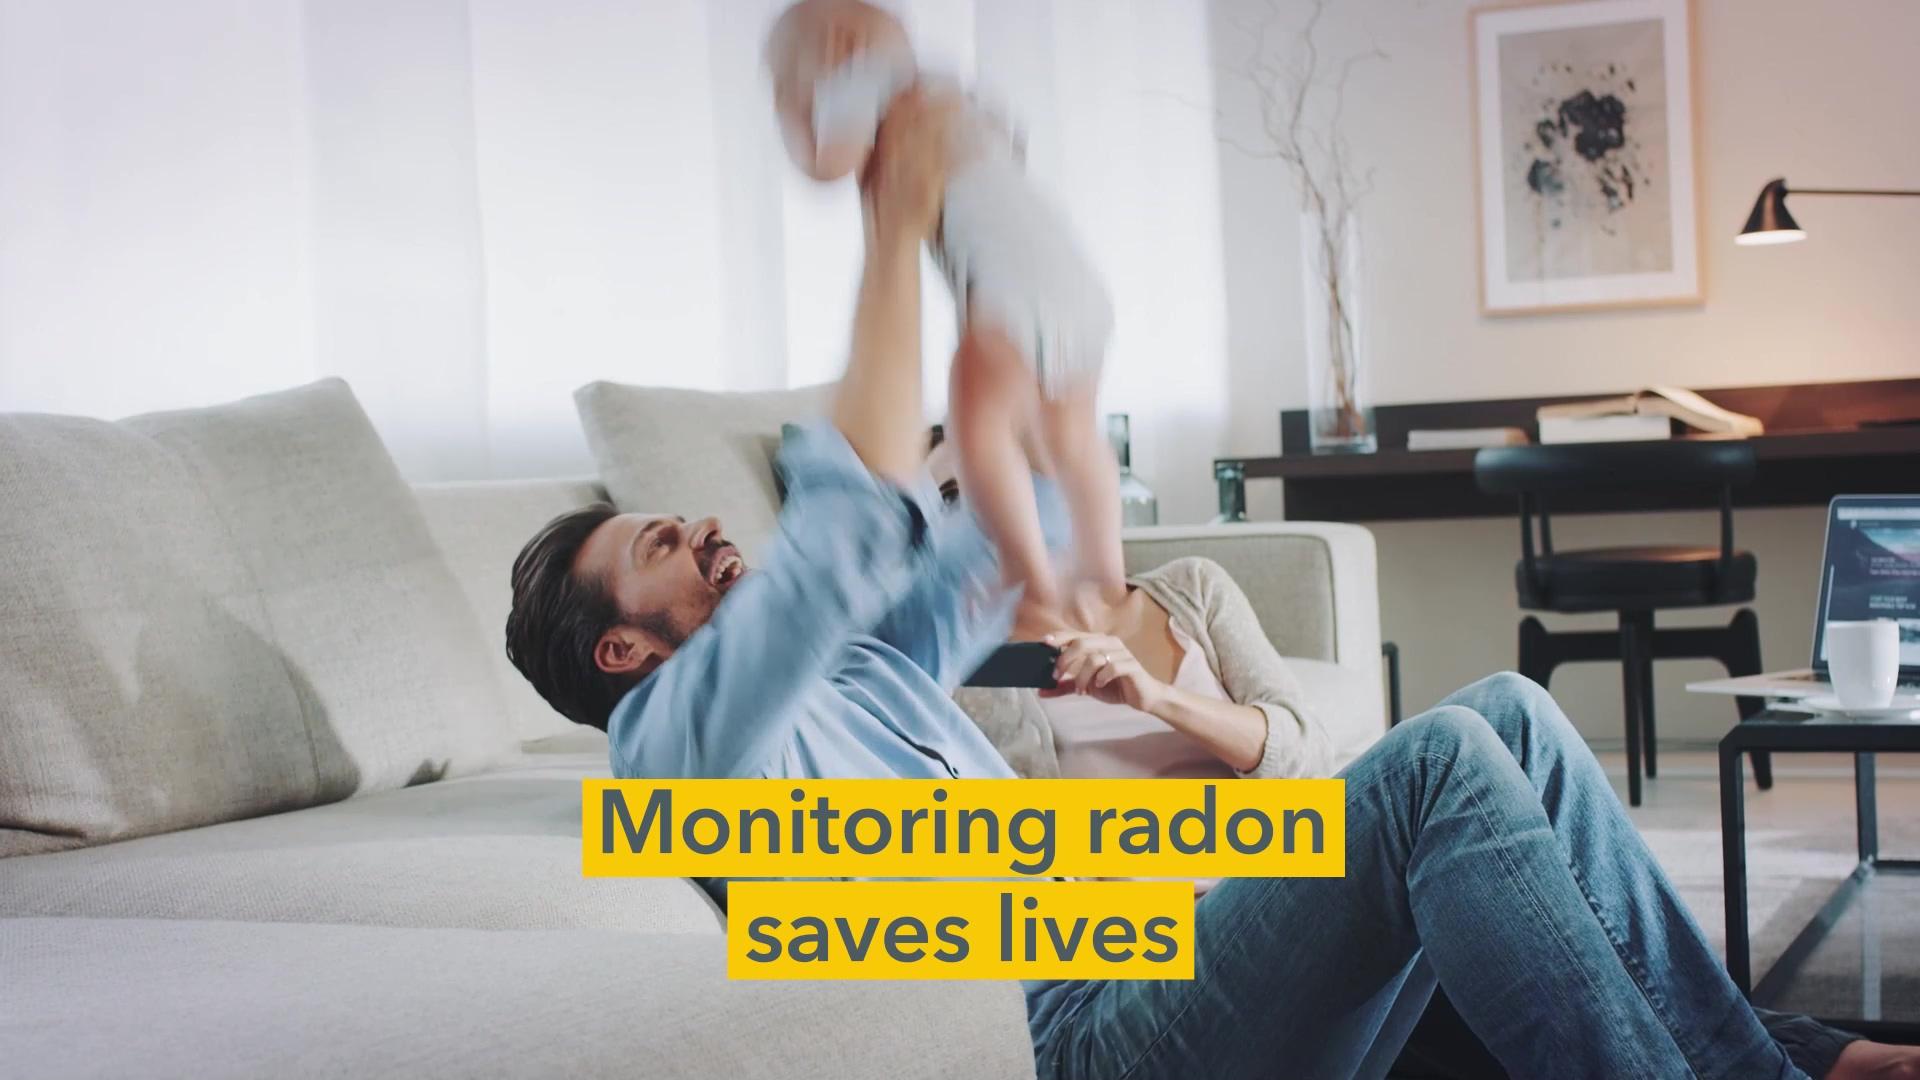 airthings-radon-campaign-30s-EN-CA-052021